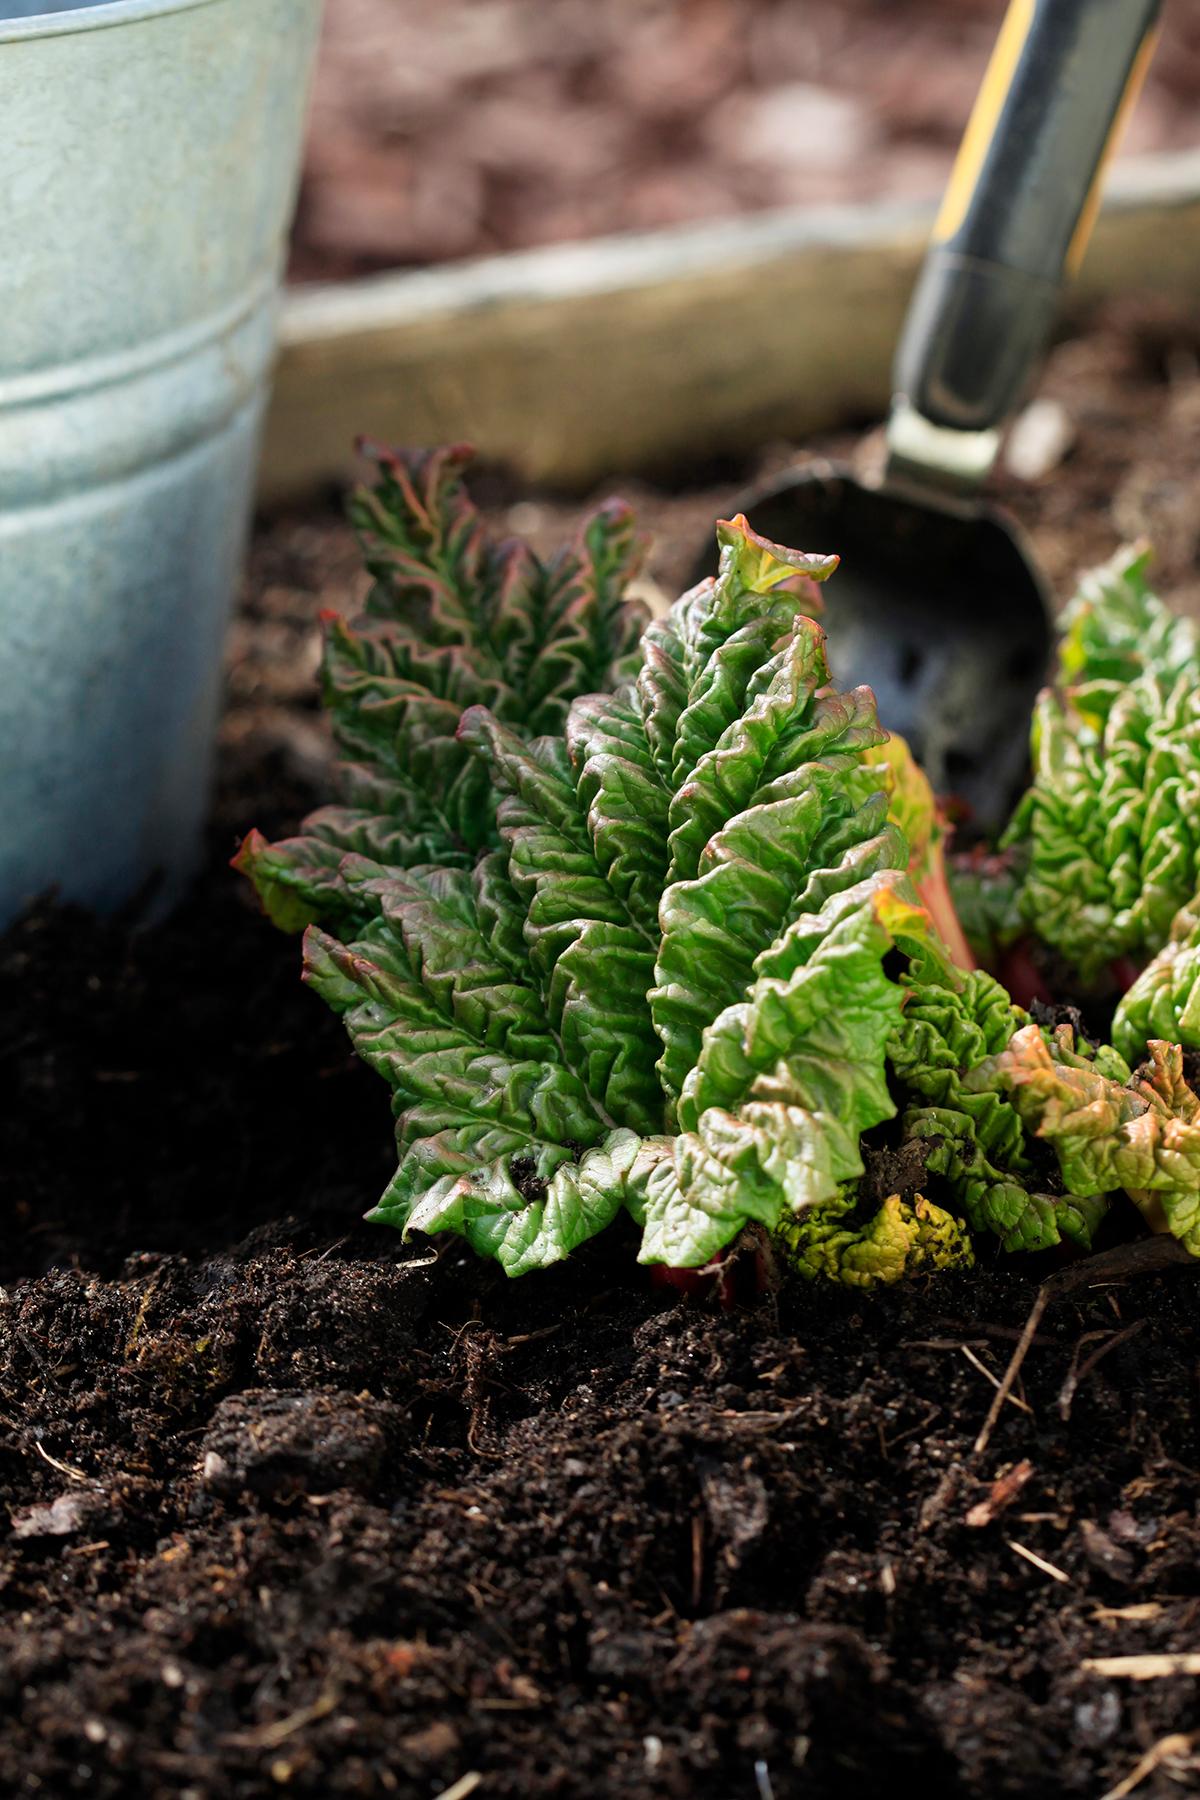 Rabarber planterad i kompost